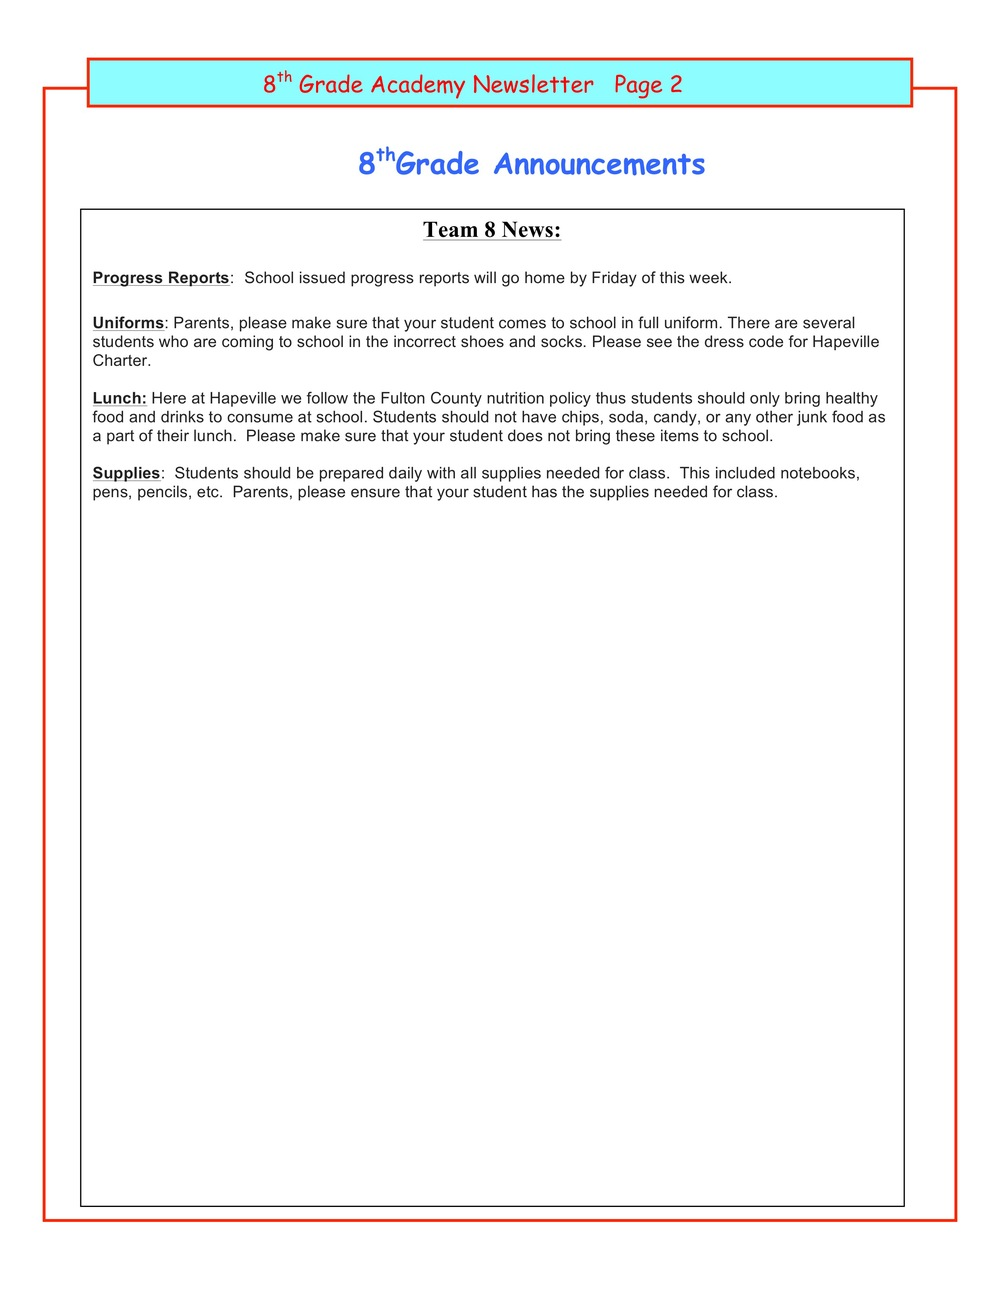 Newsletter Image8th grade October 15 2014 2.jpeg